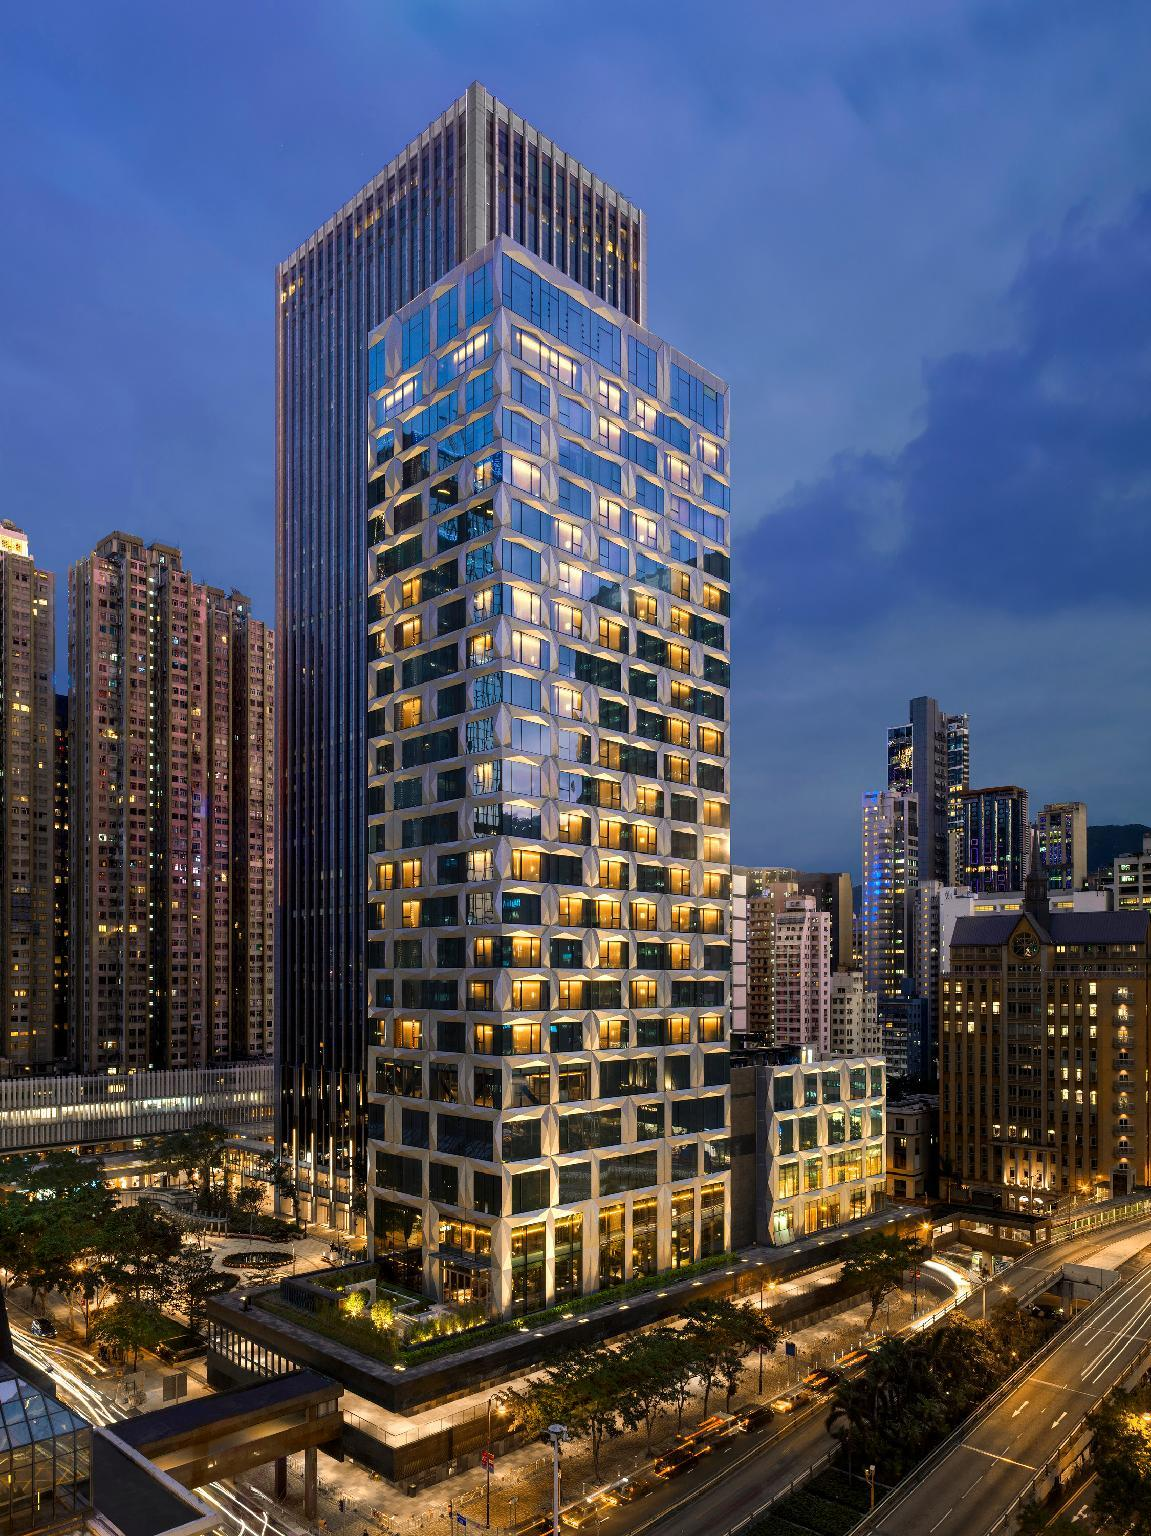 The St. Regis Hong Kong, Wan Chai